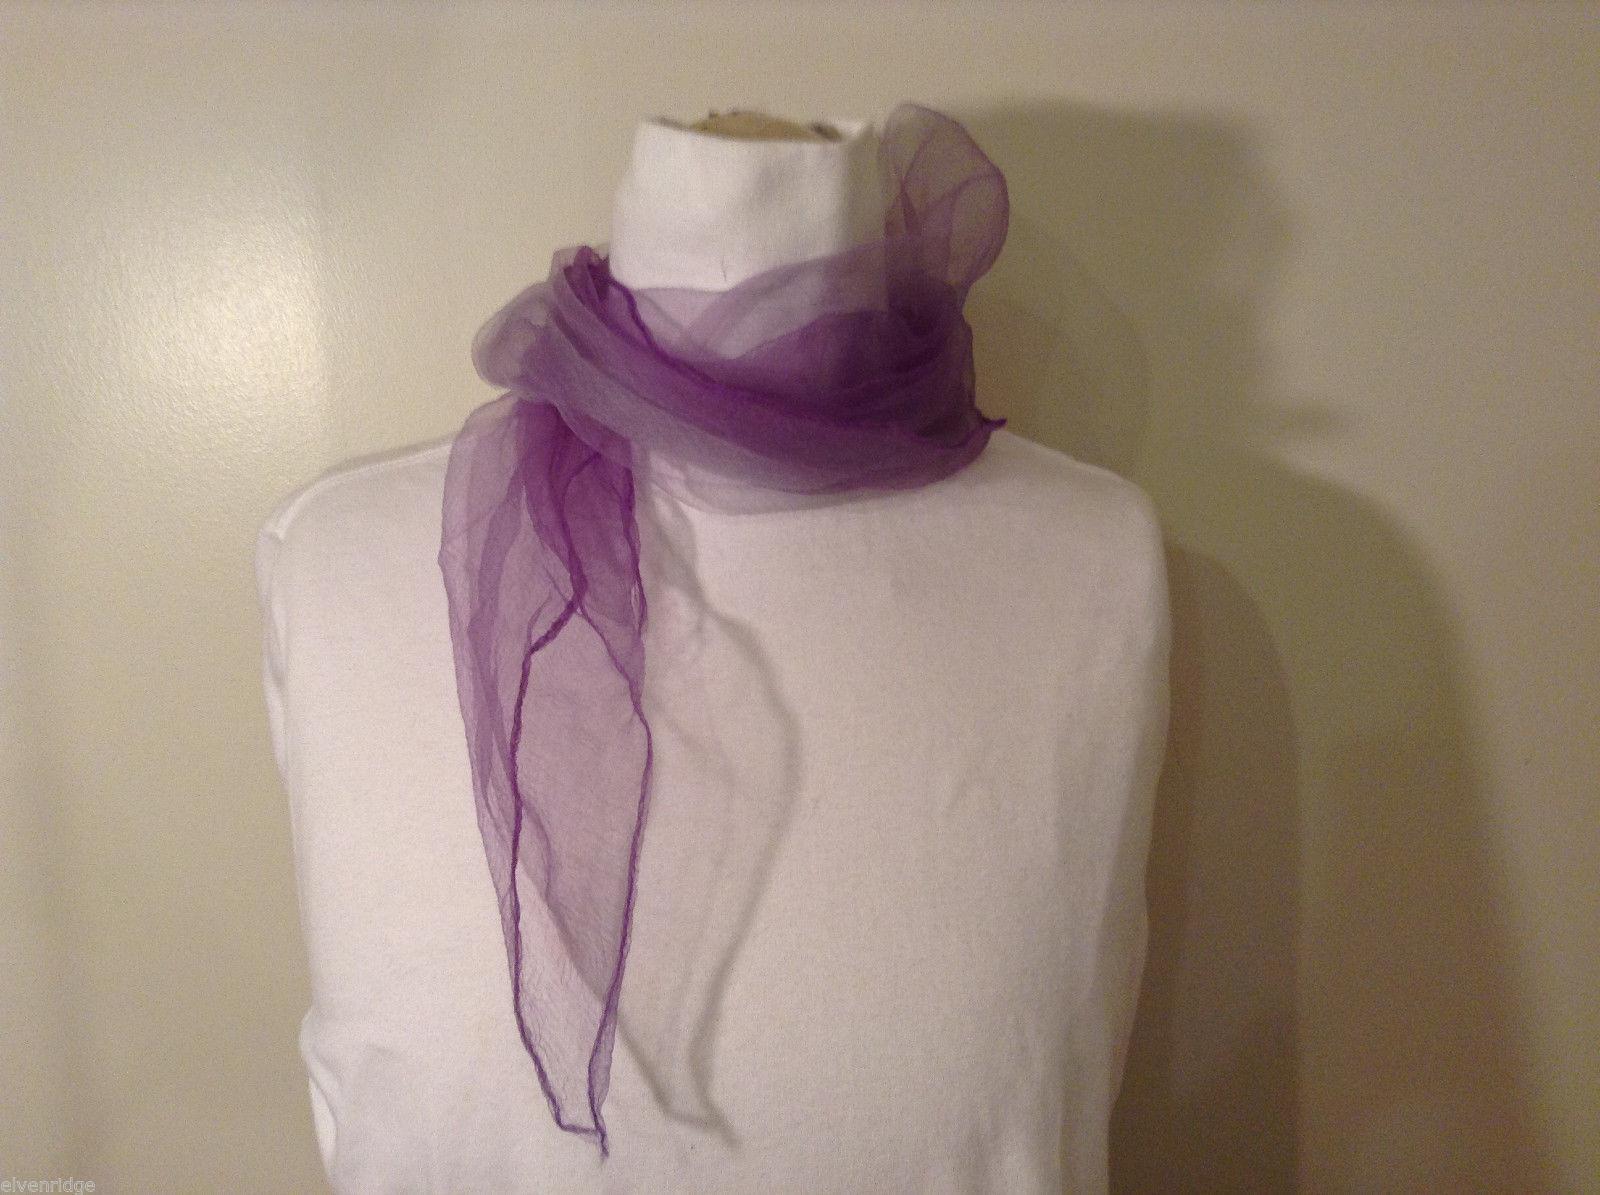 Vintage Purple Gauze Sheer Square Scarf for repair/repurposing 100% nylon